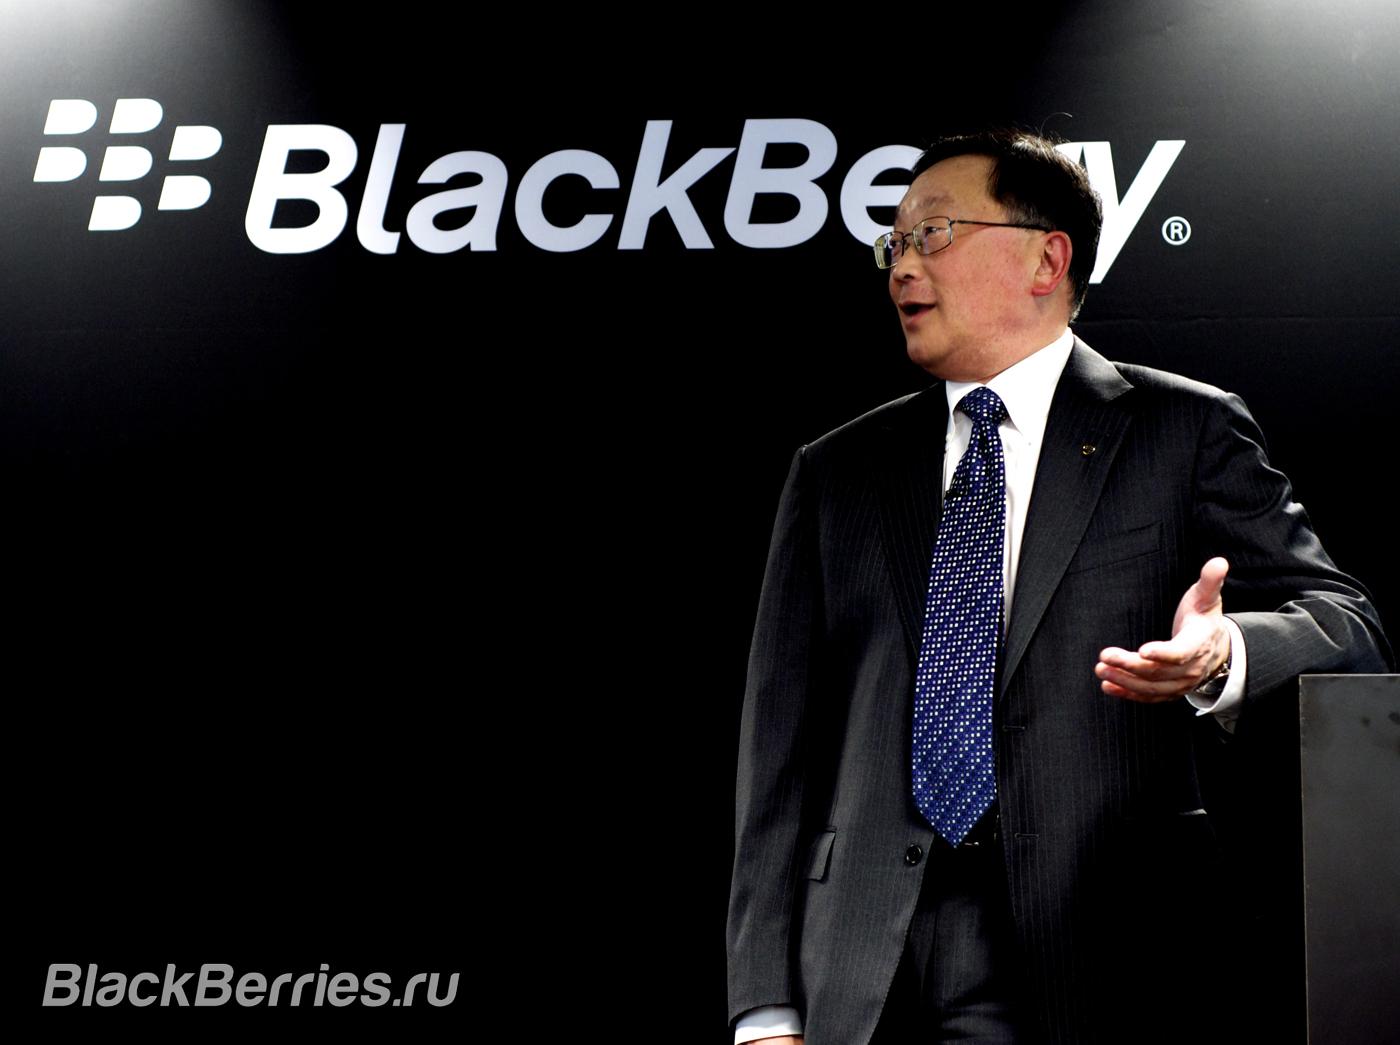 BlackBerry-MWC2015-02